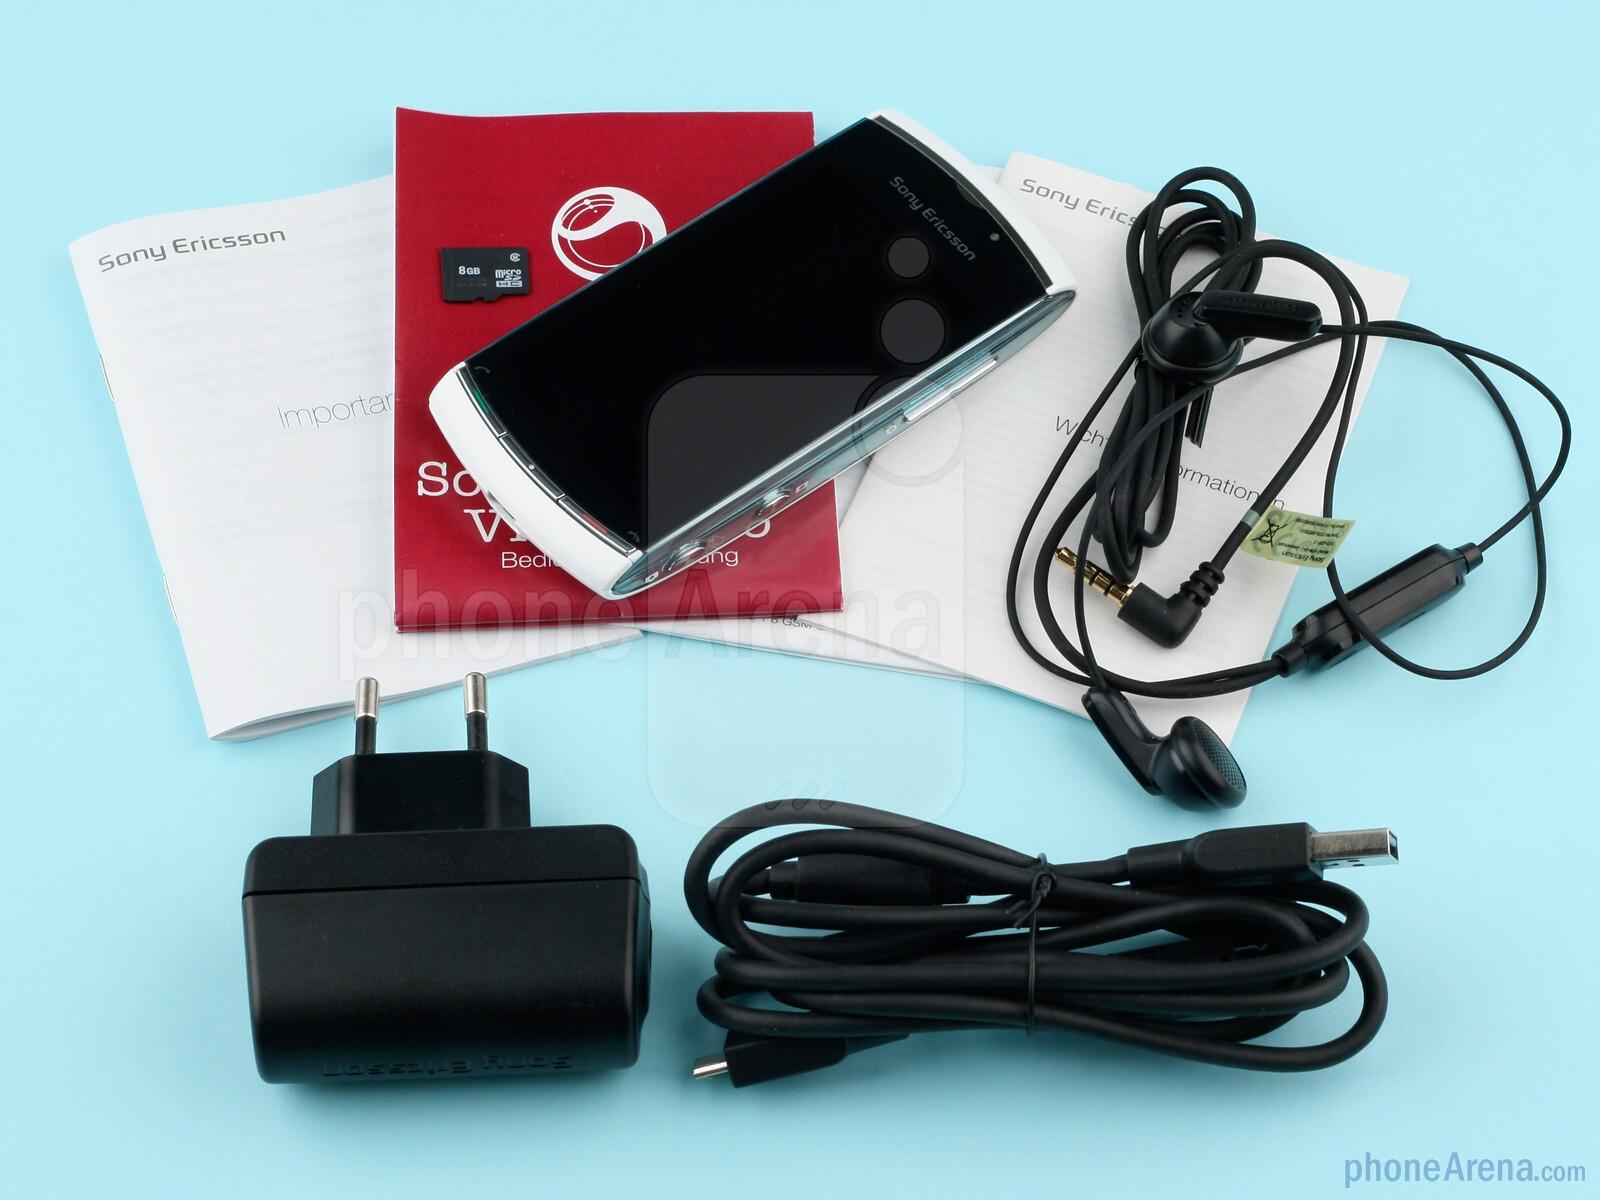 sony ericsson vivaz pro review rh phonearena com Sony Ericsson Phones sony ericsson vivaz pro manual pdf